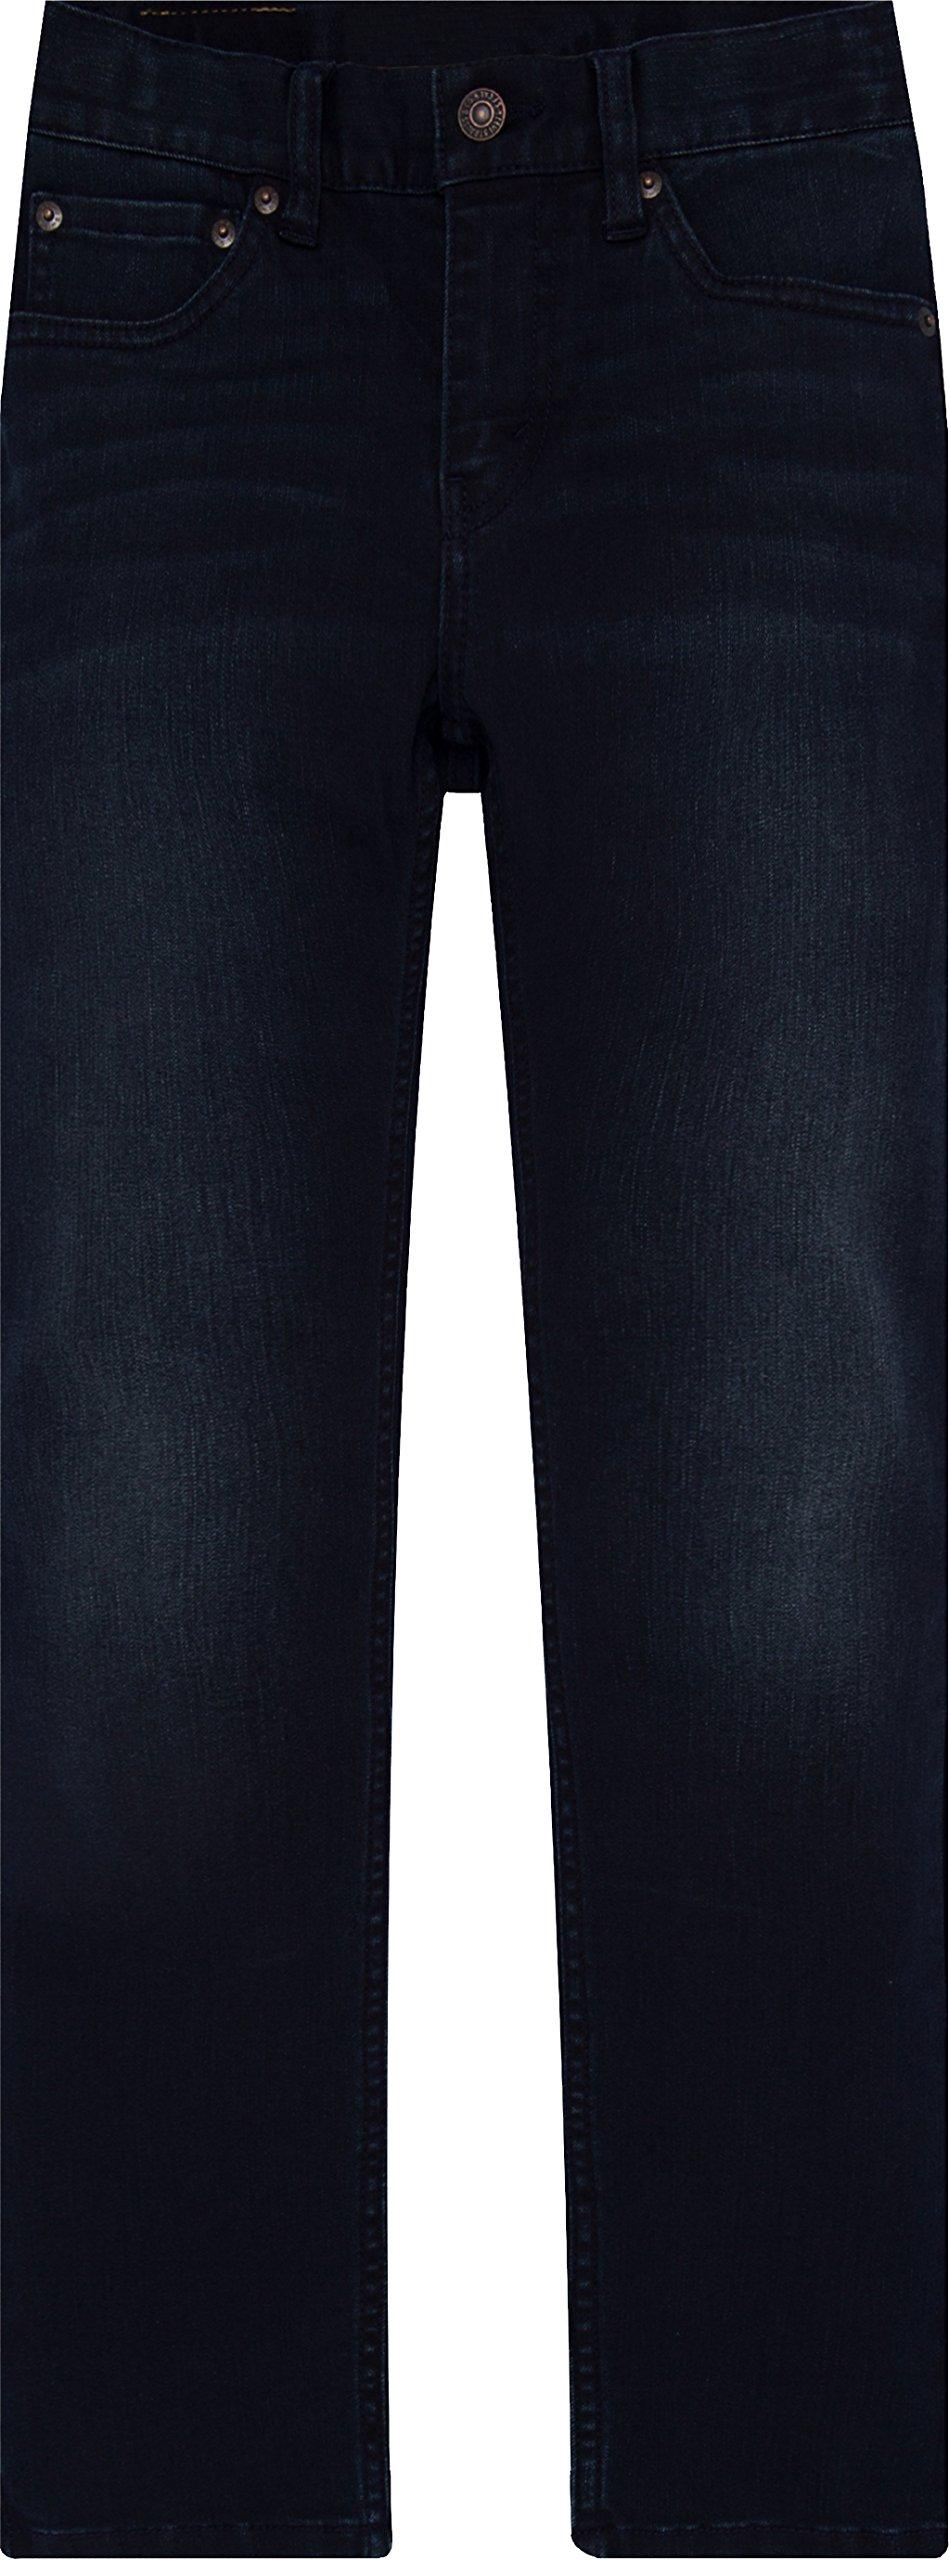 Levi's Little Boys' 511 Slim Fit Jeans, Nightswatch, 5